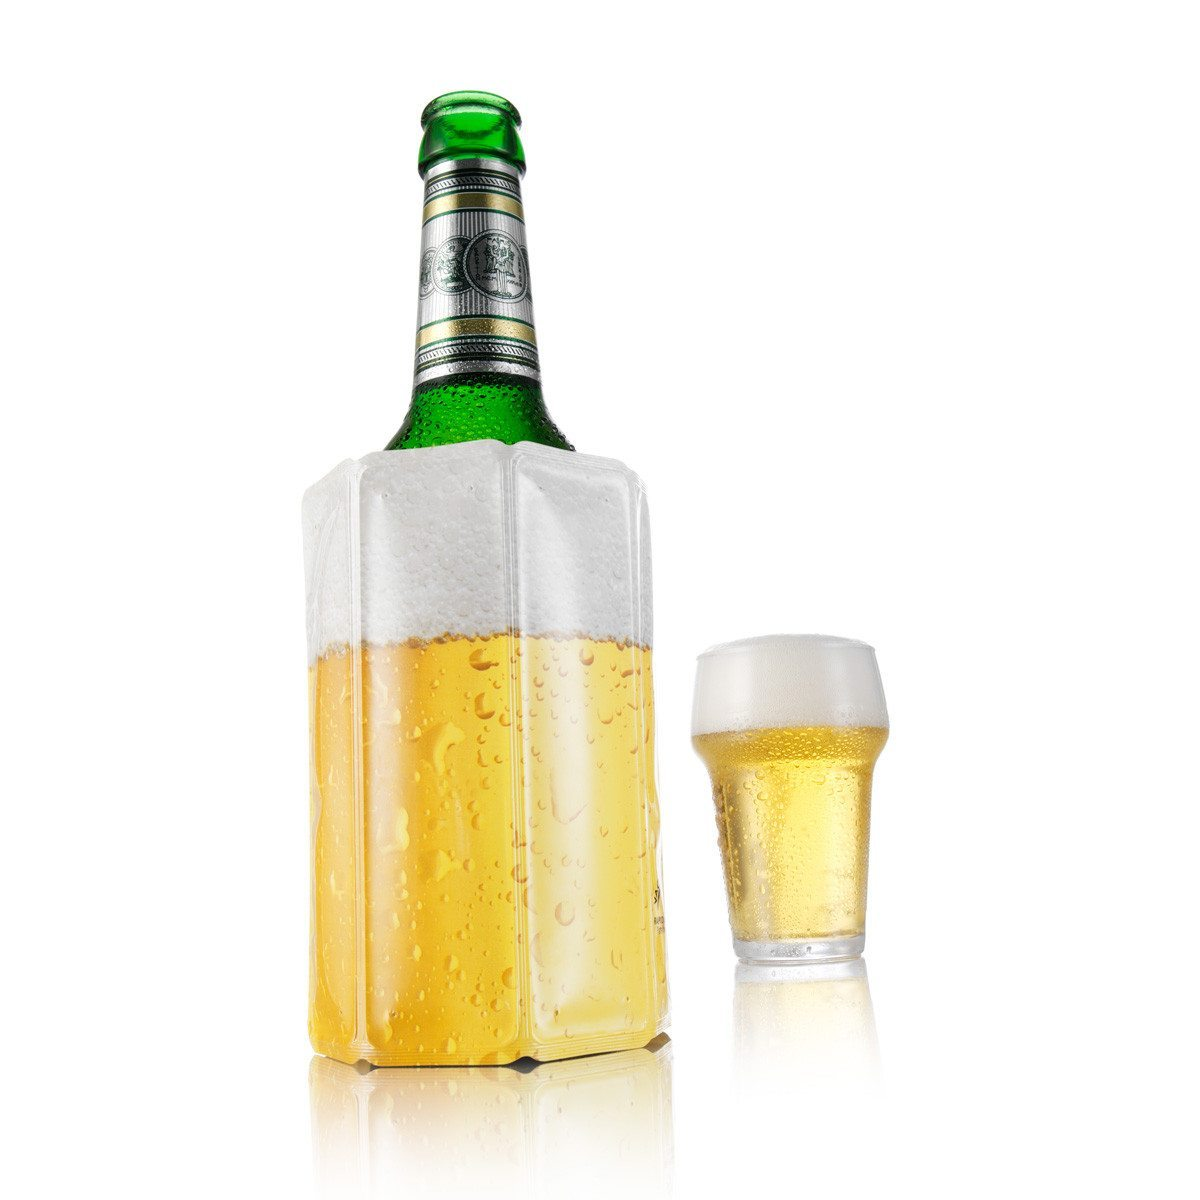 1, 2, kalt - Aktiv-Kühler für Bier